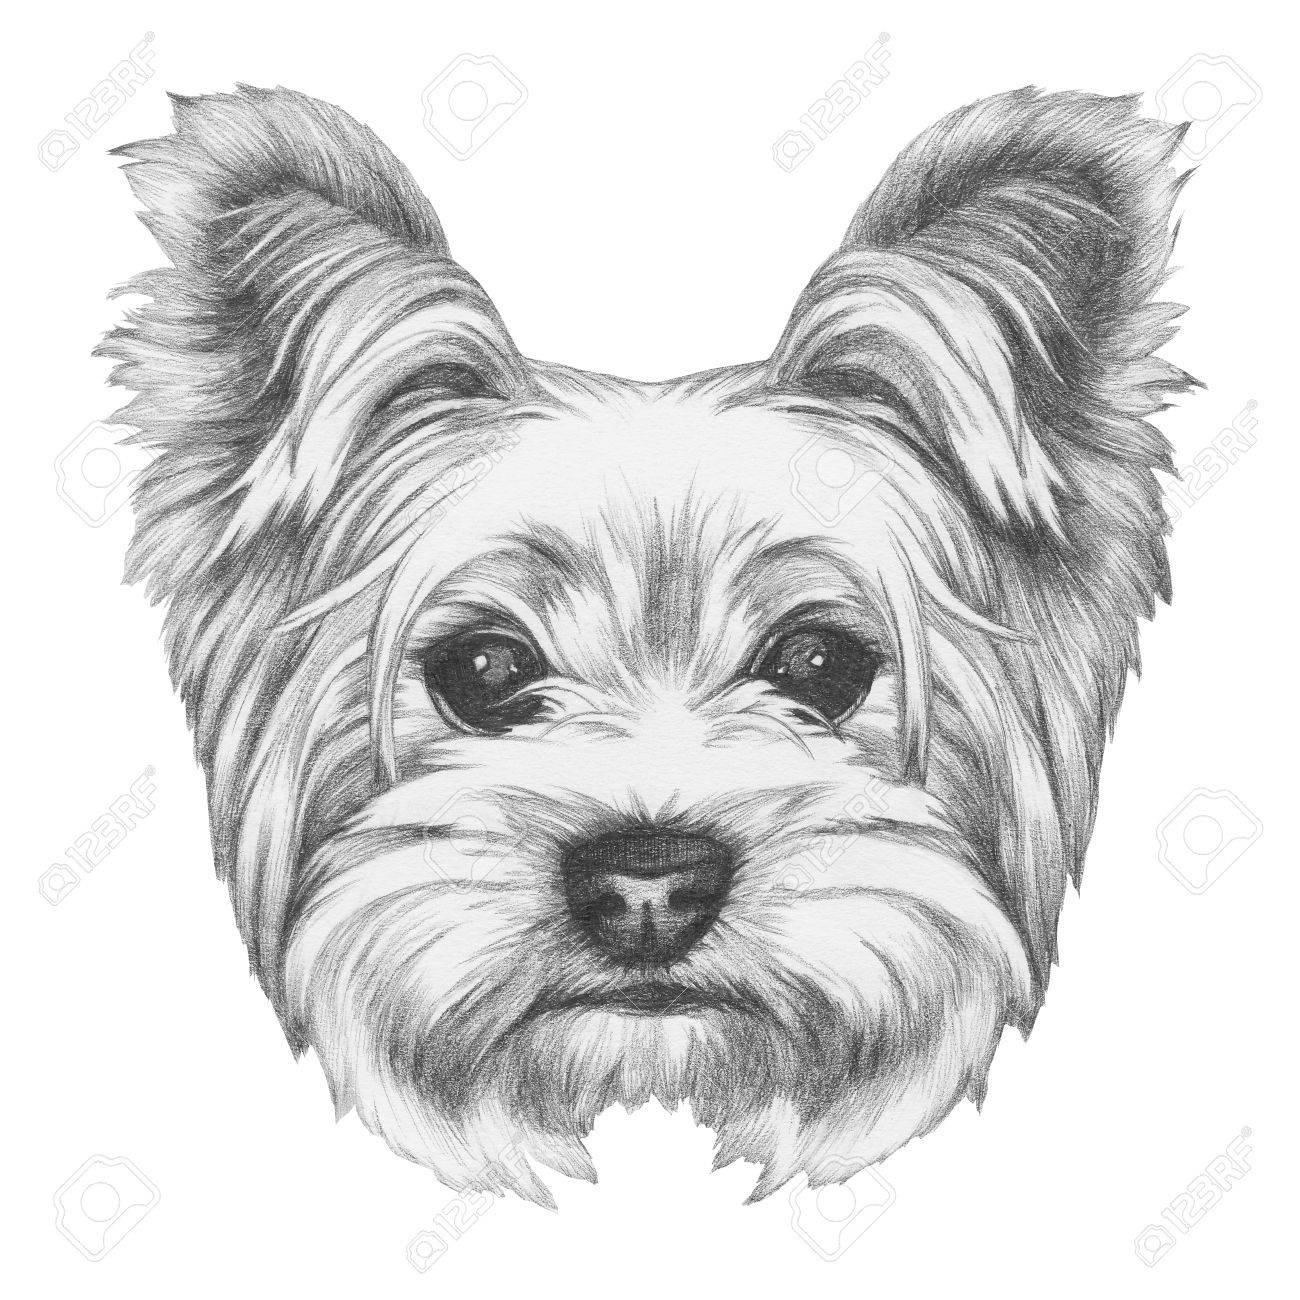 Portrait Of Yorkshire Terrier Dog Hand Drawn Illustration Stock